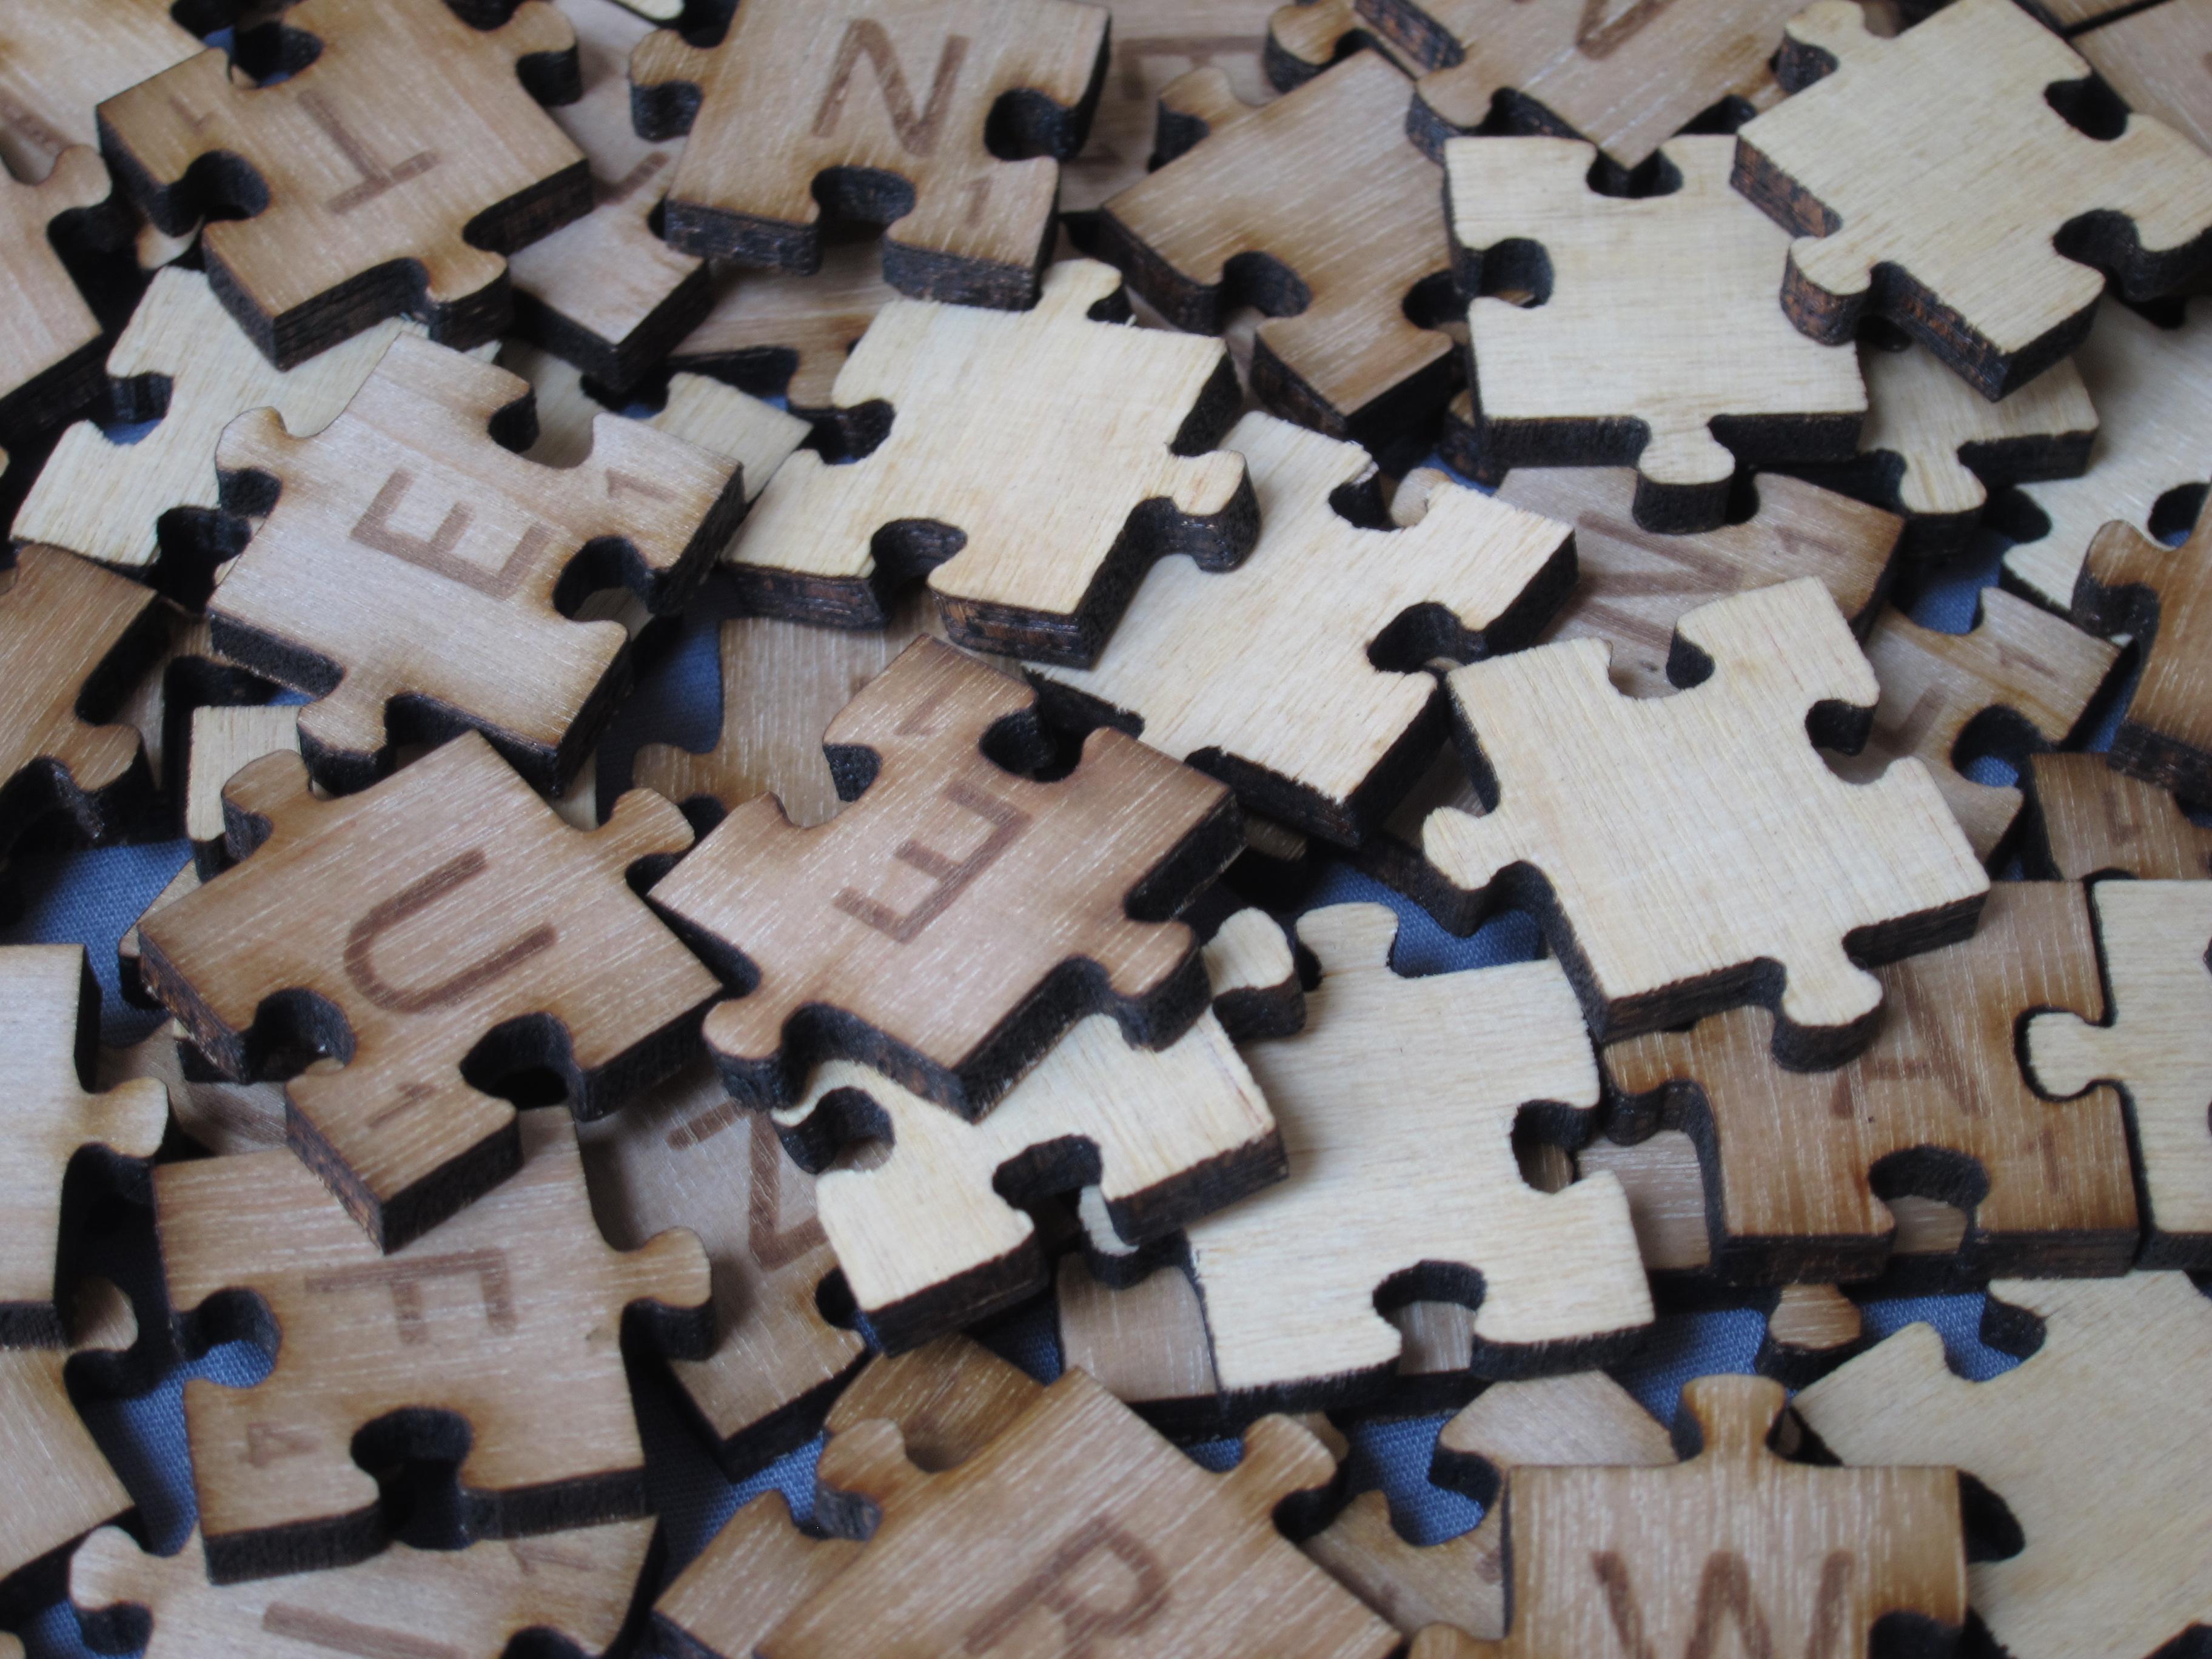 Scrabble stones